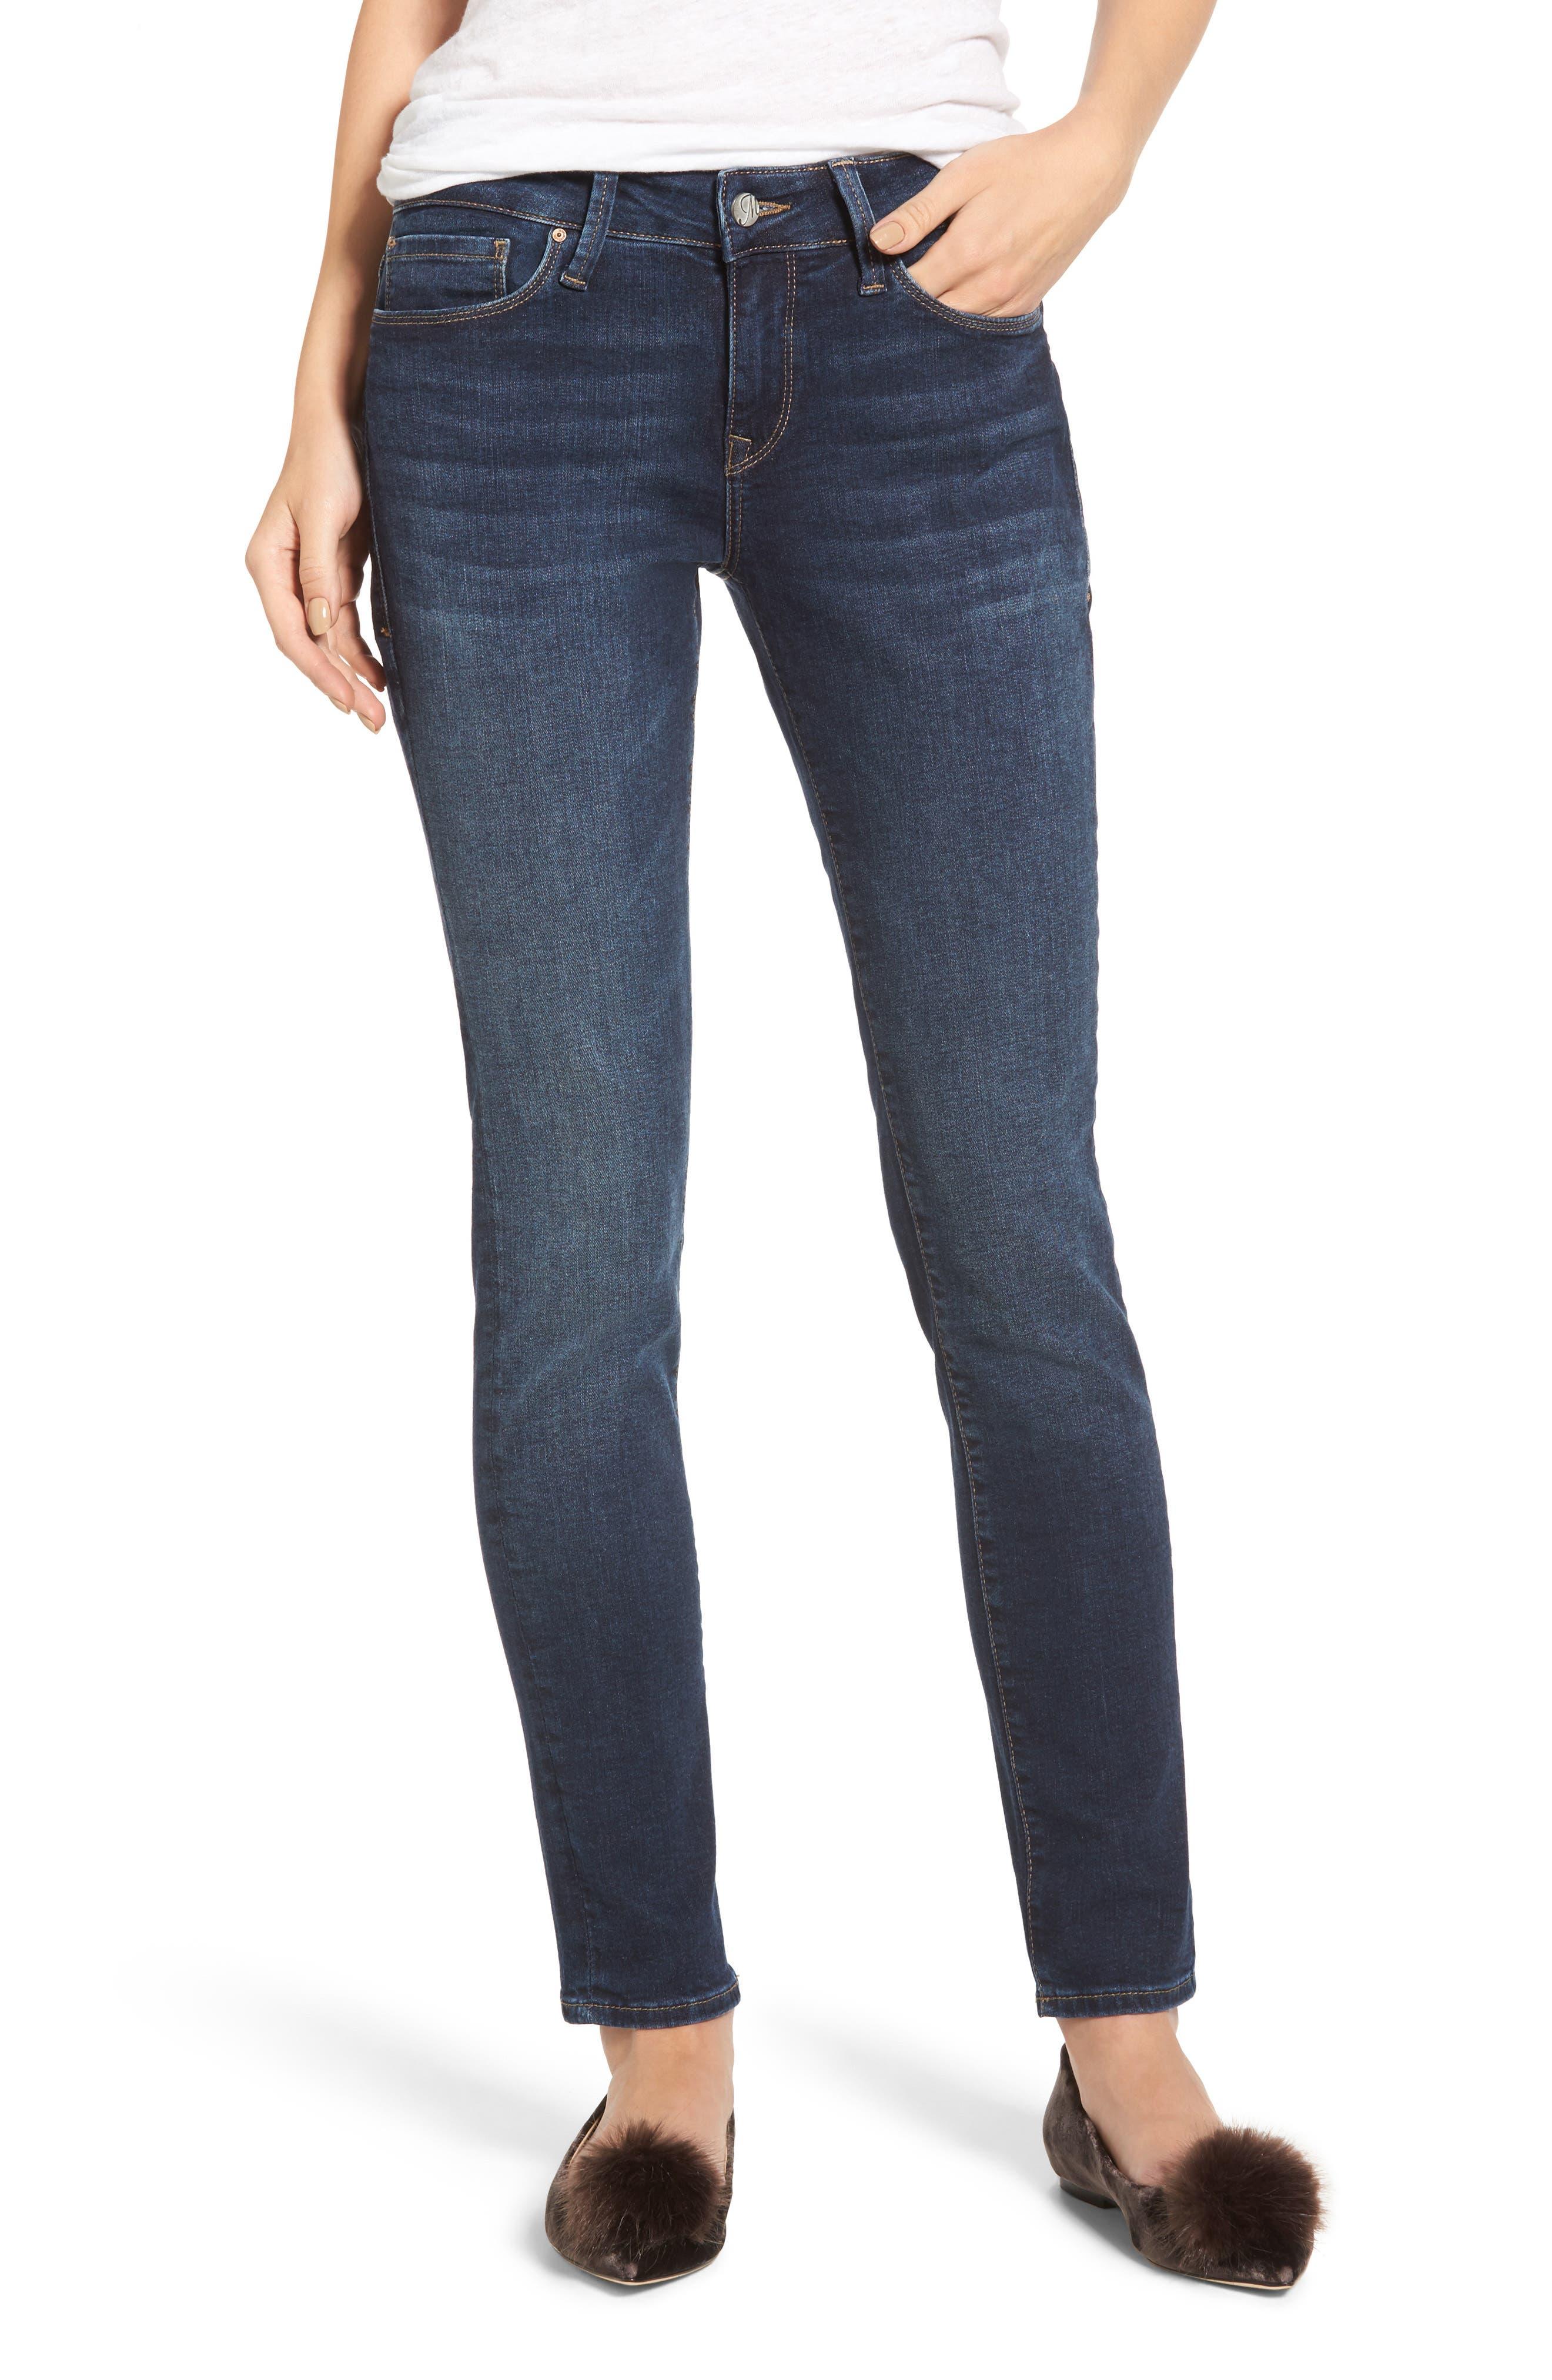 MAVI JEANS Alexa Stretch Ankle Skinny Jeans